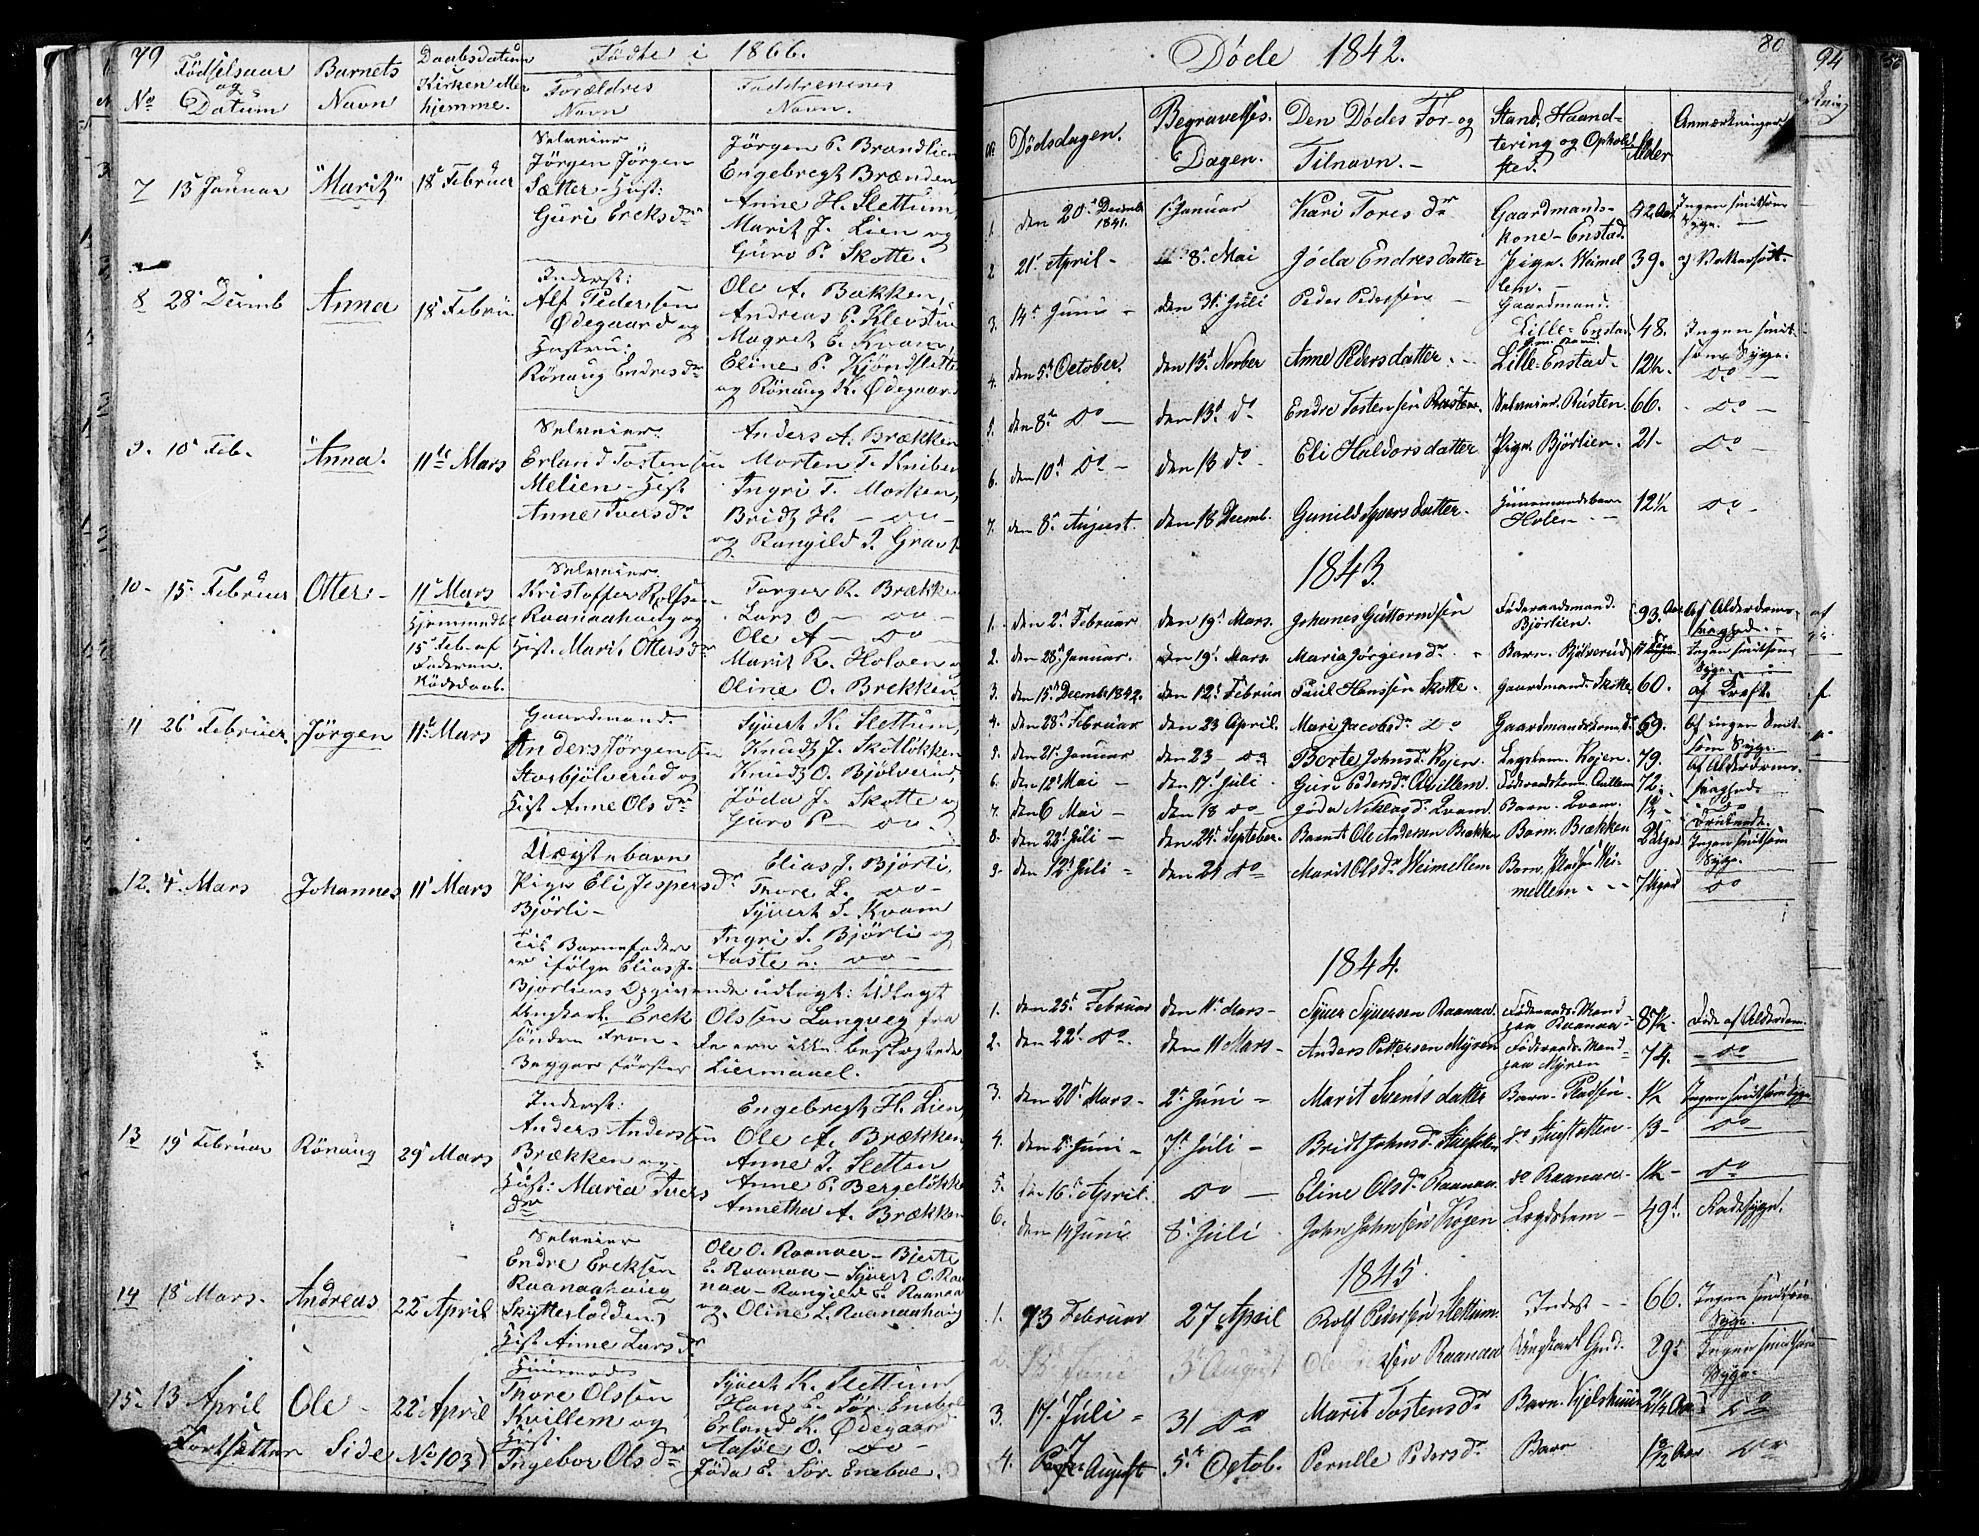 SAH, Lesja prestekontor, Klokkerbok nr. 4, 1842-1871, s. 79-80